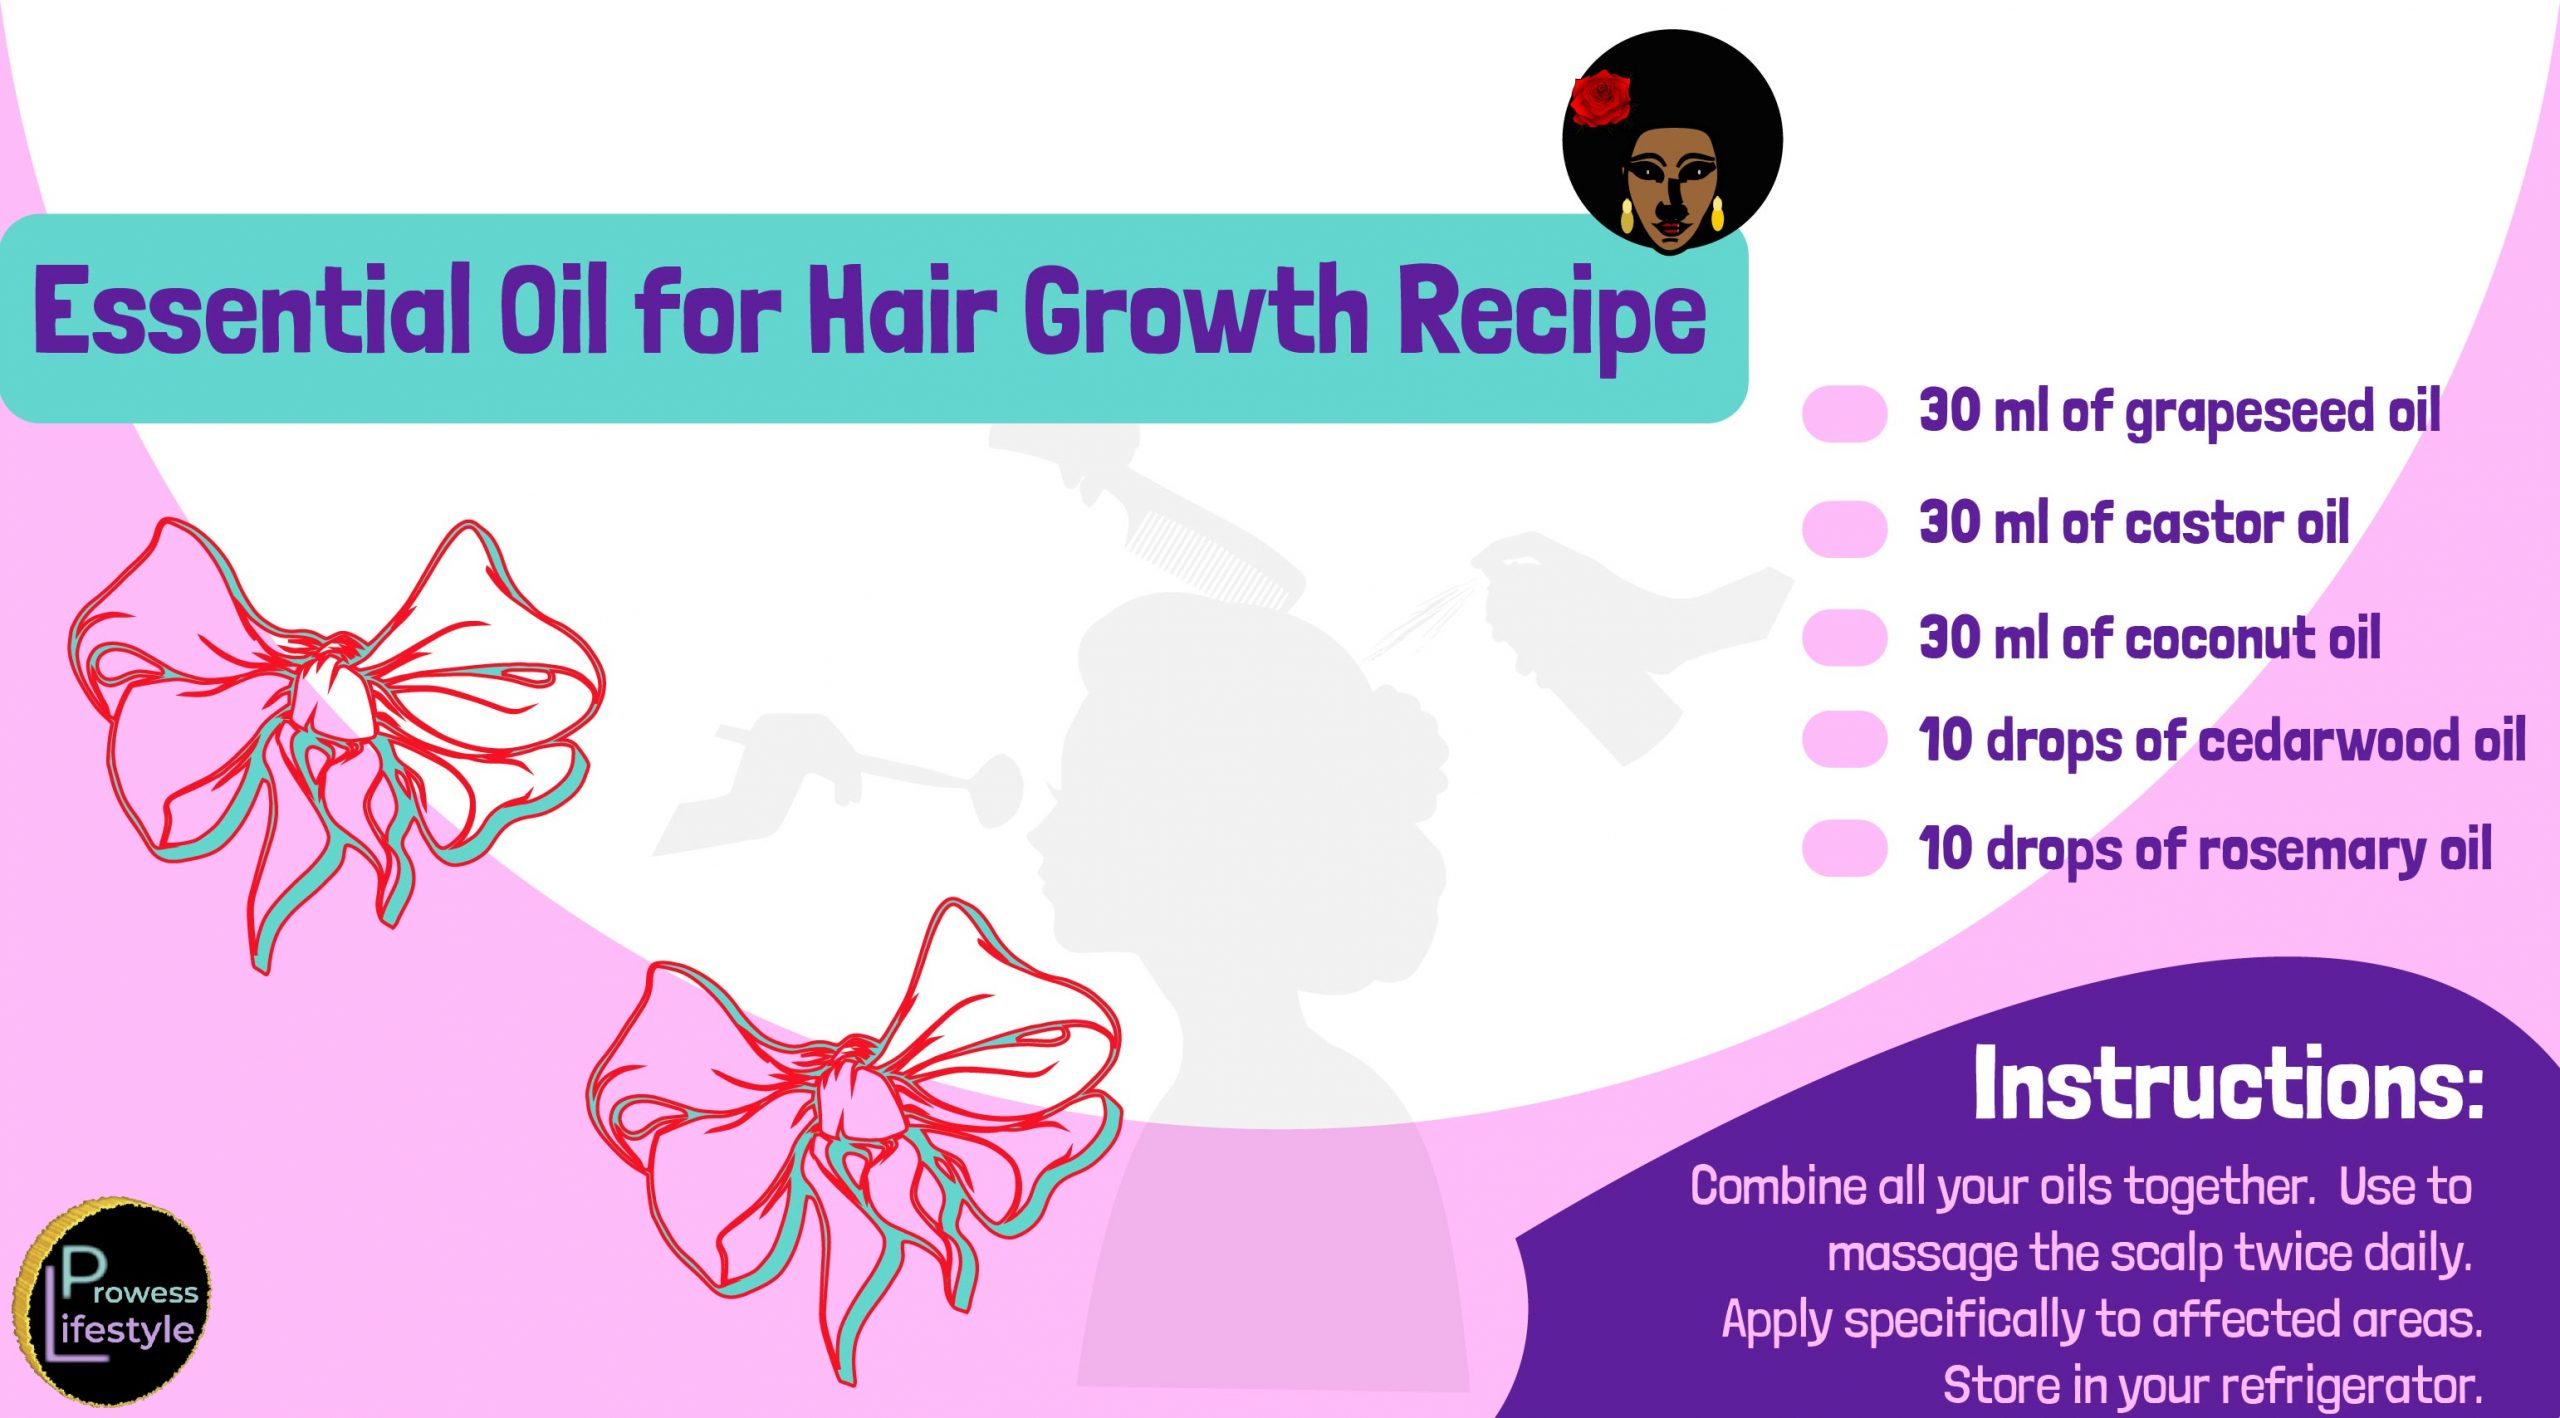 Rosemary and cedarwood hair growth recipe